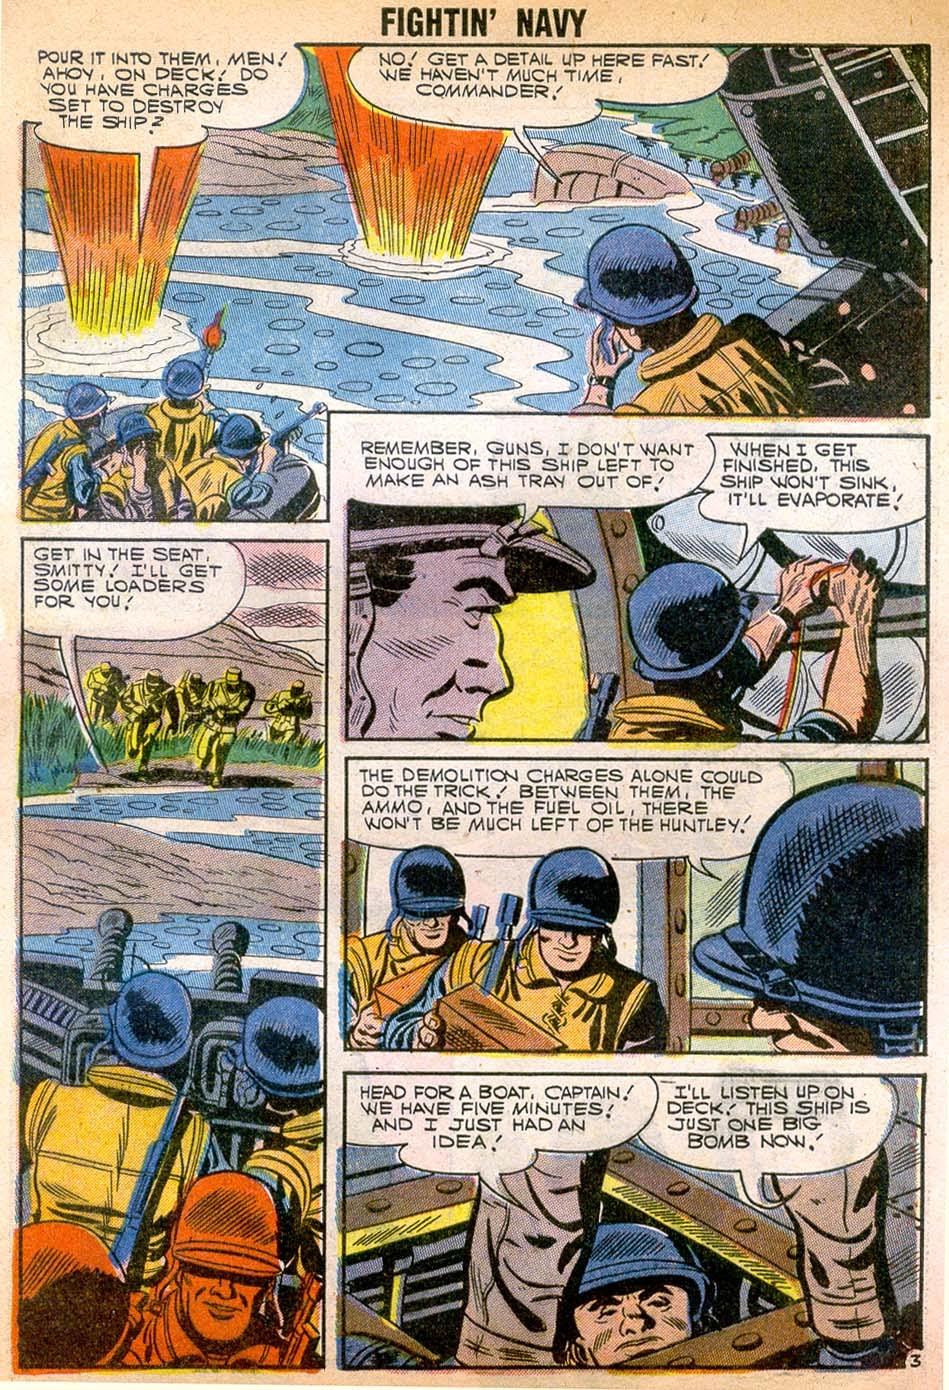 Read online Fightin' Navy comic -  Issue #79 - 29